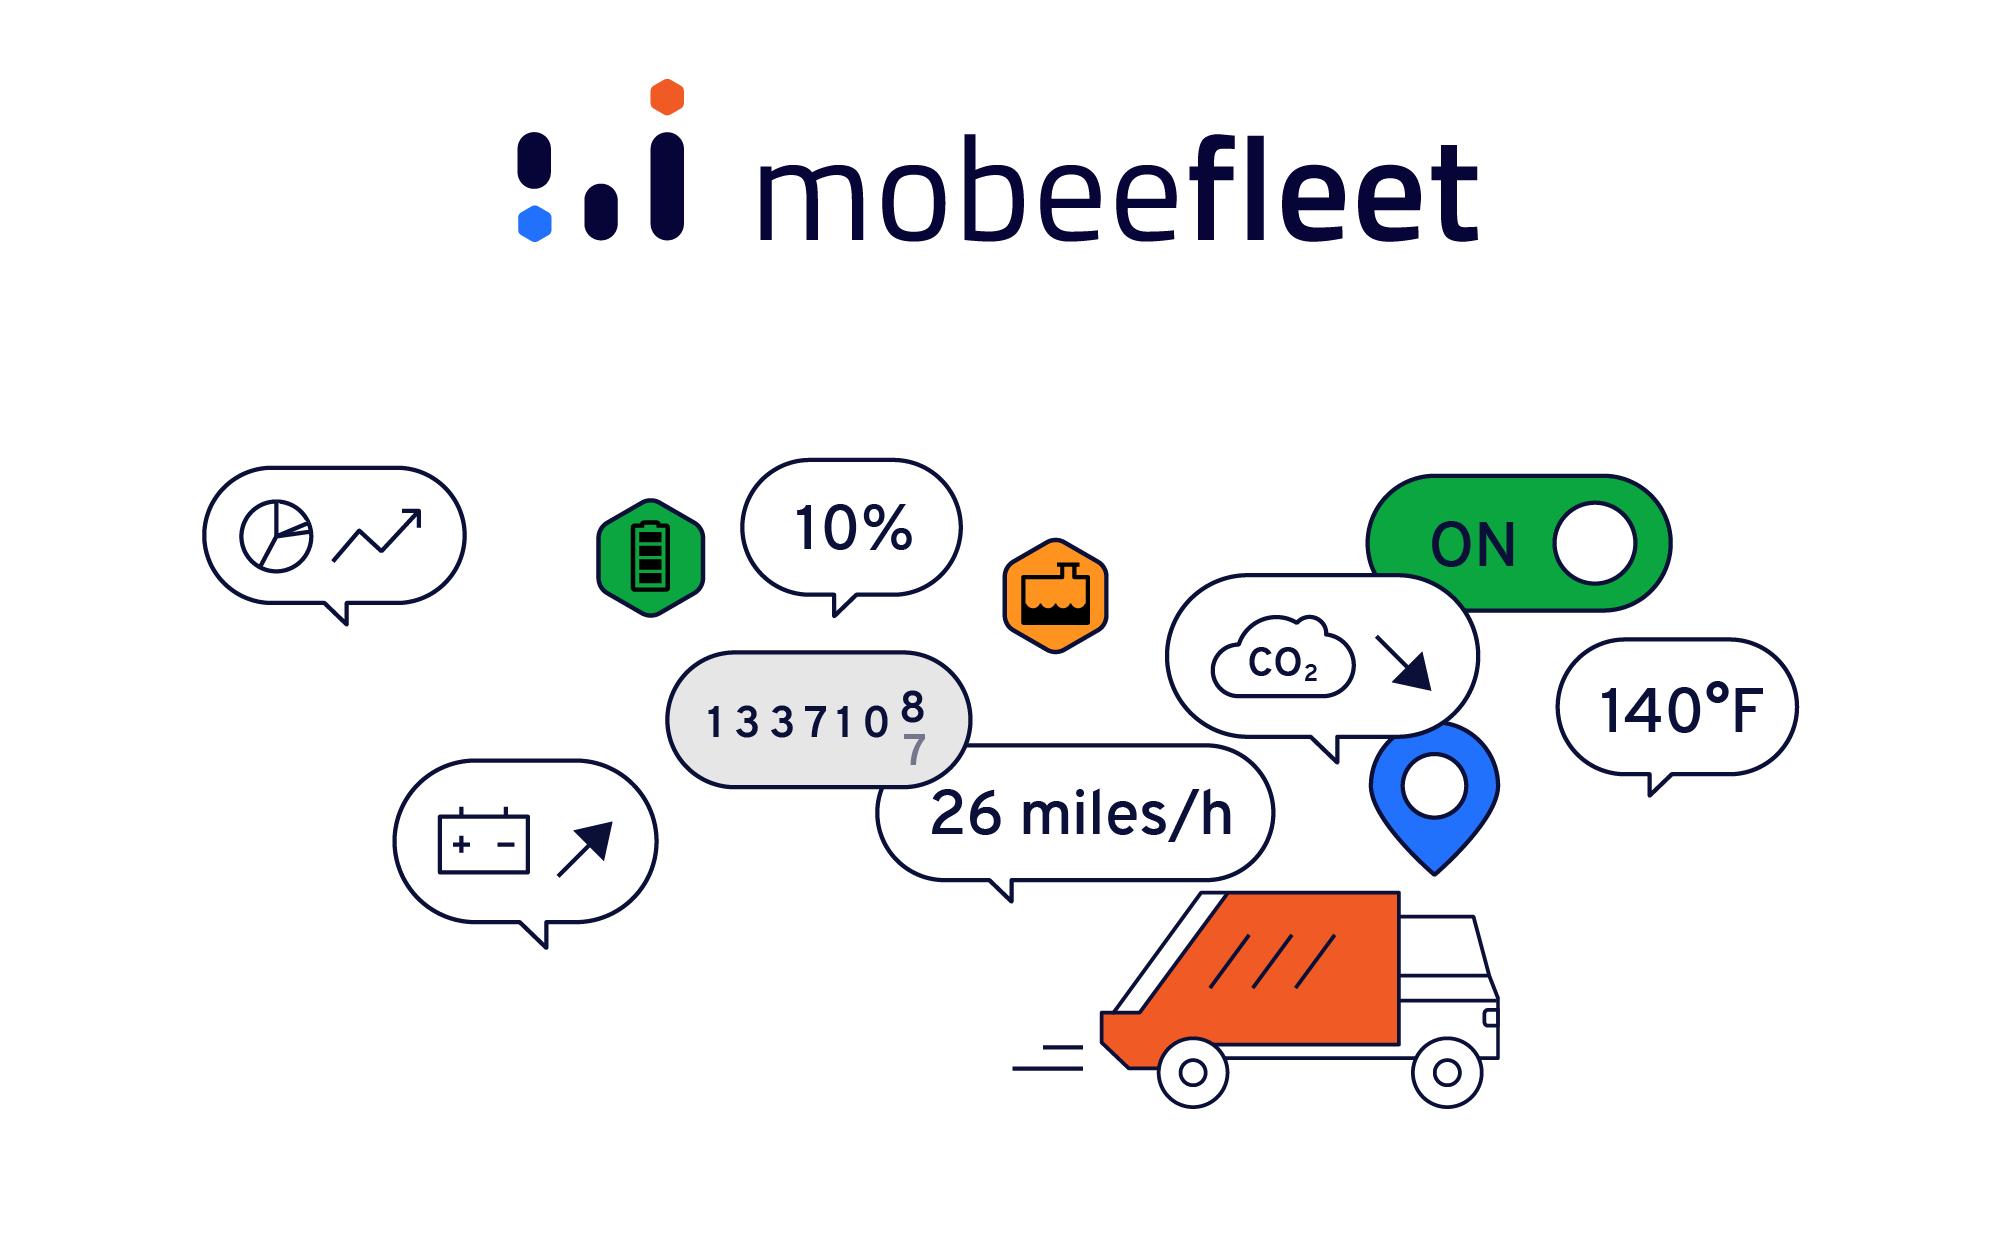 Mobeefleet